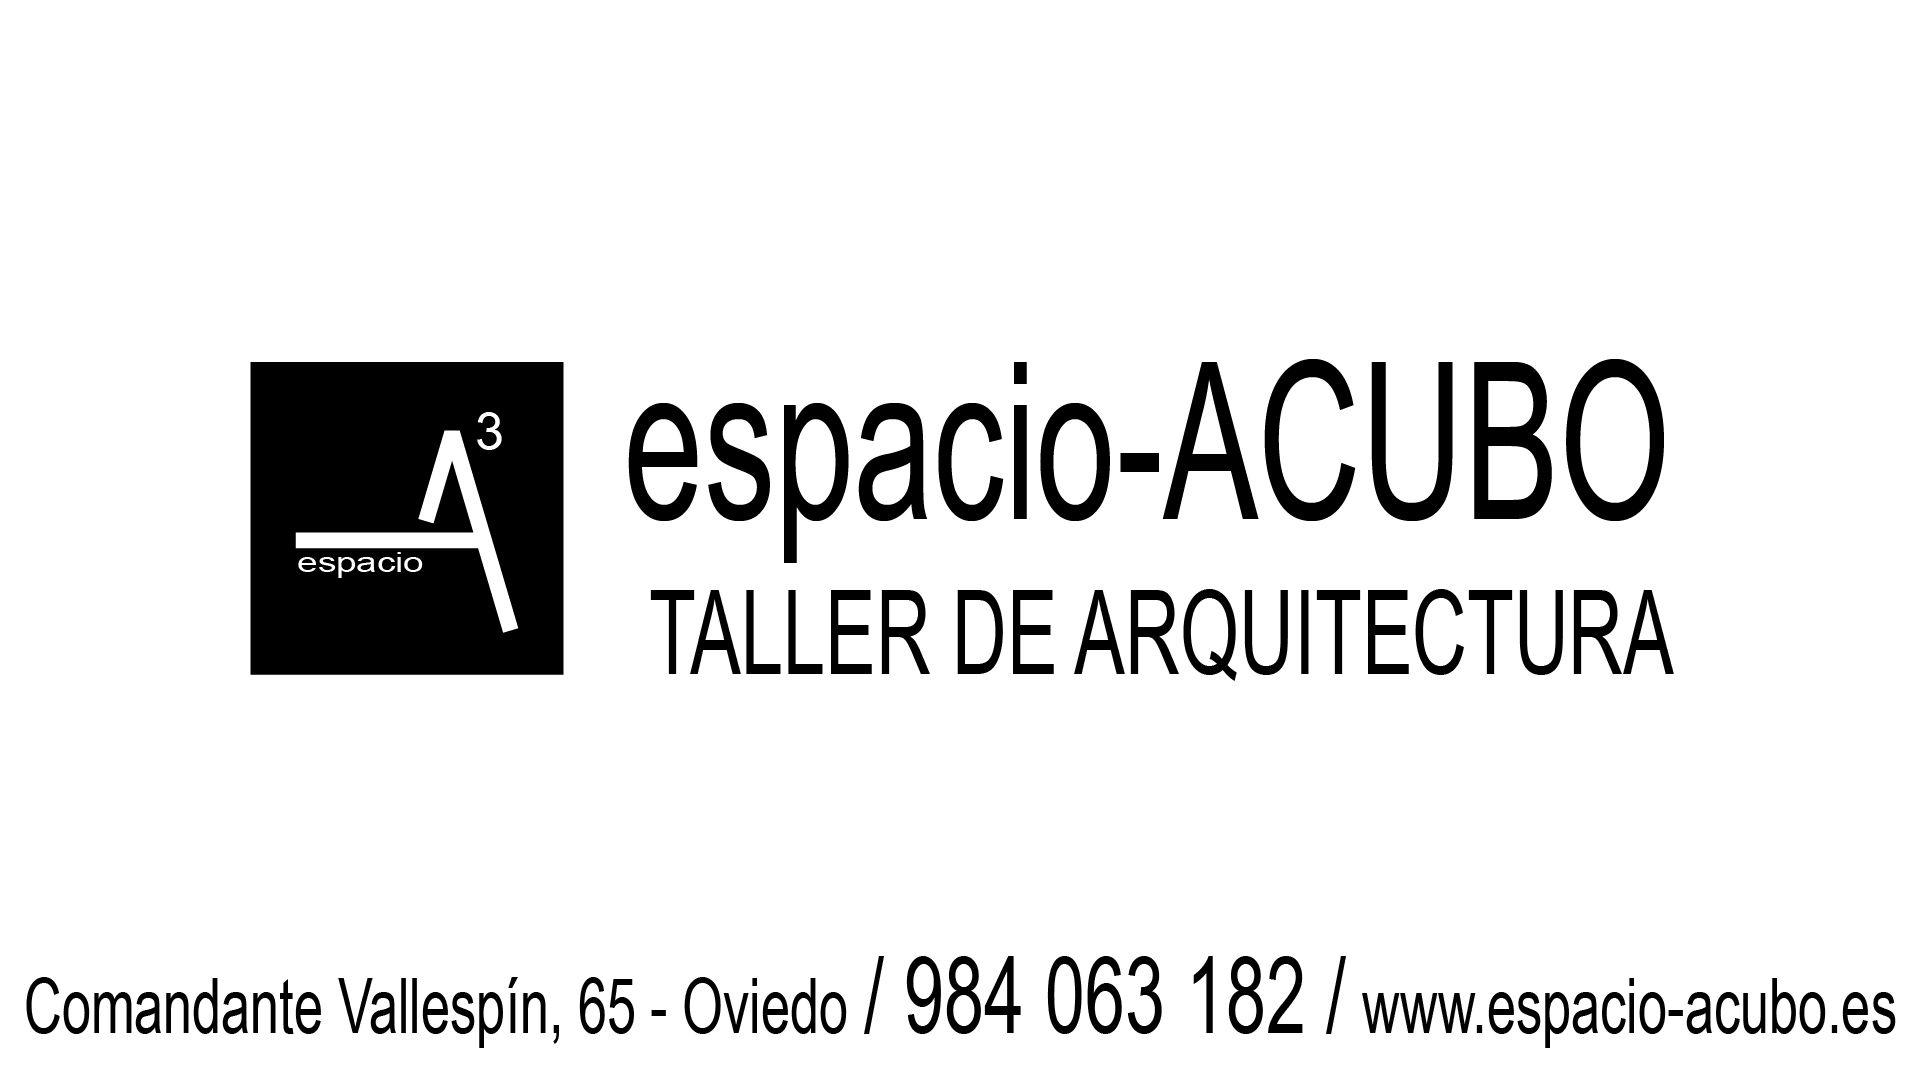 espacio-ACUBO  Taller de Arquitectura CONTACTO